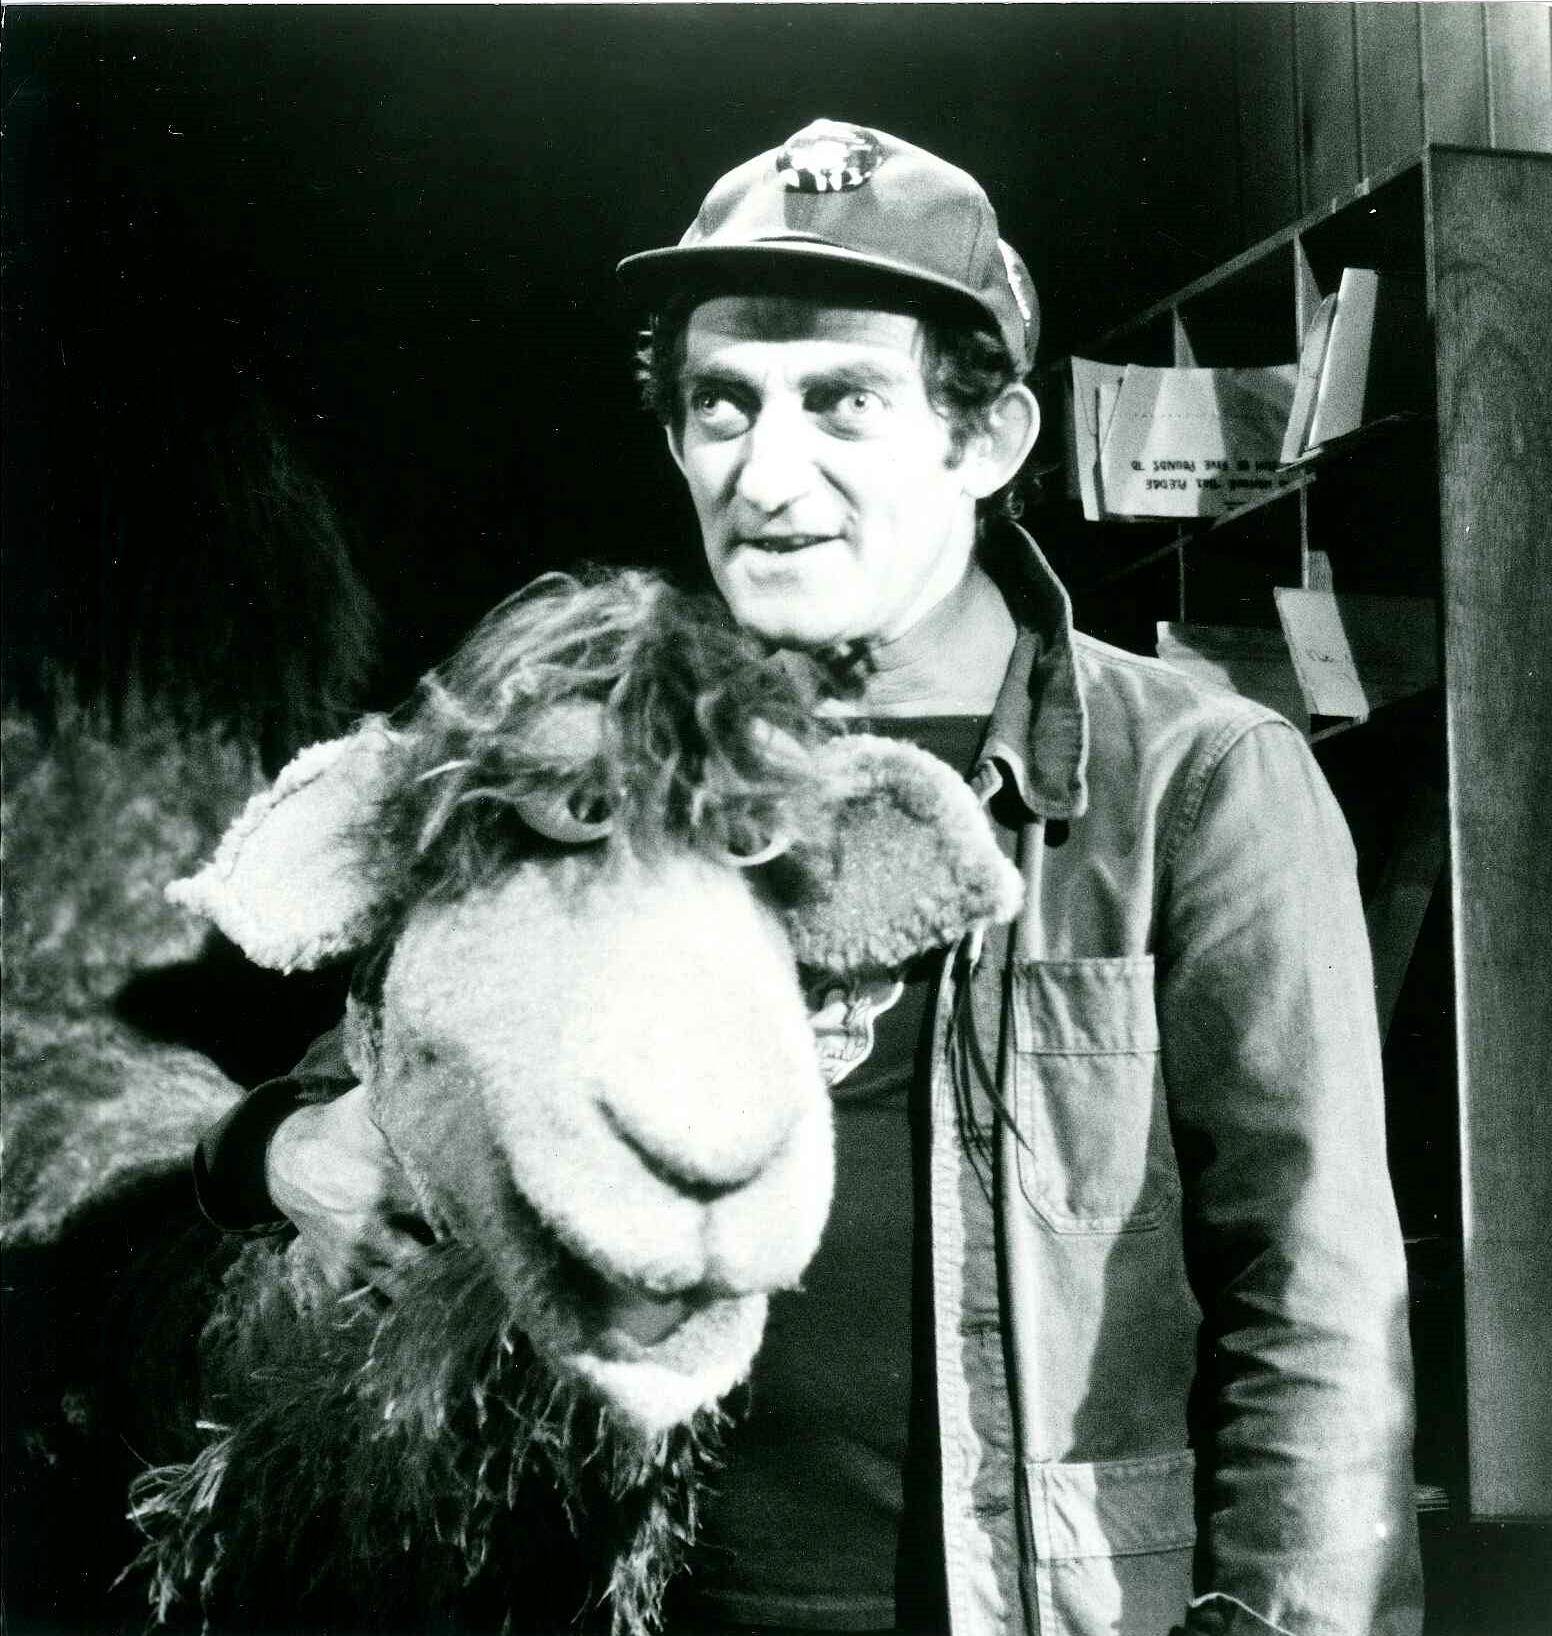 Episode 518: Marty Feldman